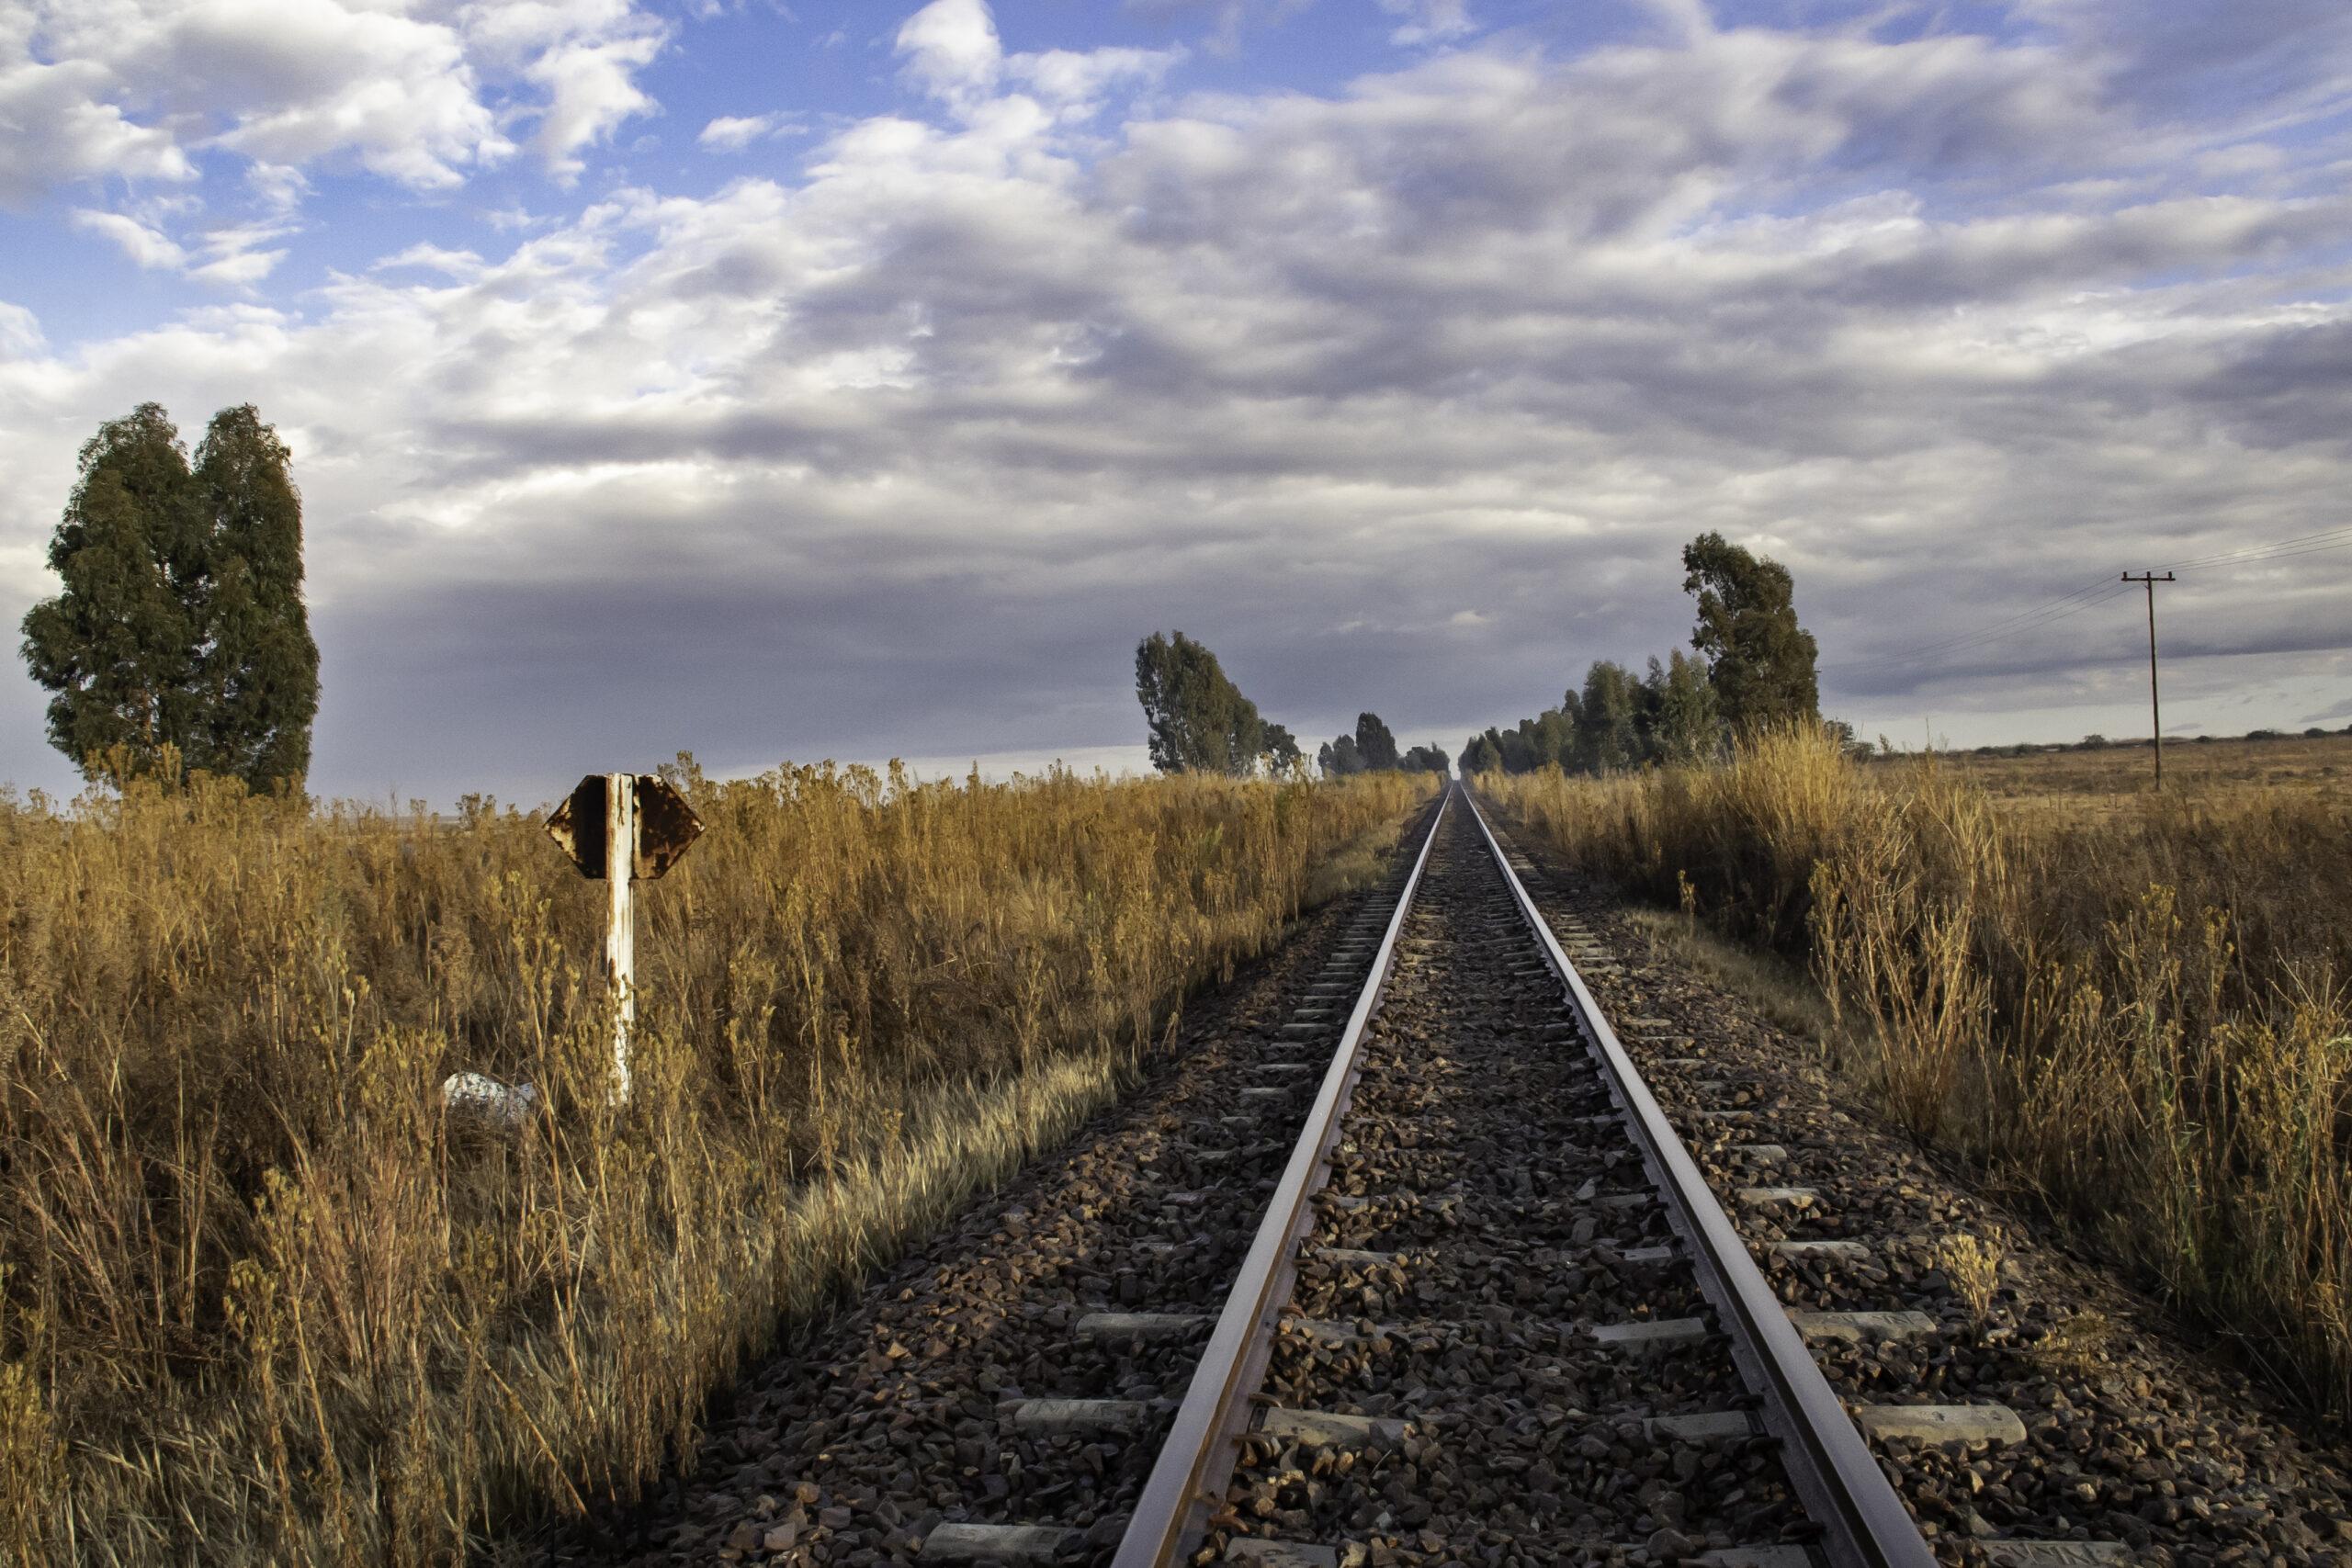 Surviving railway